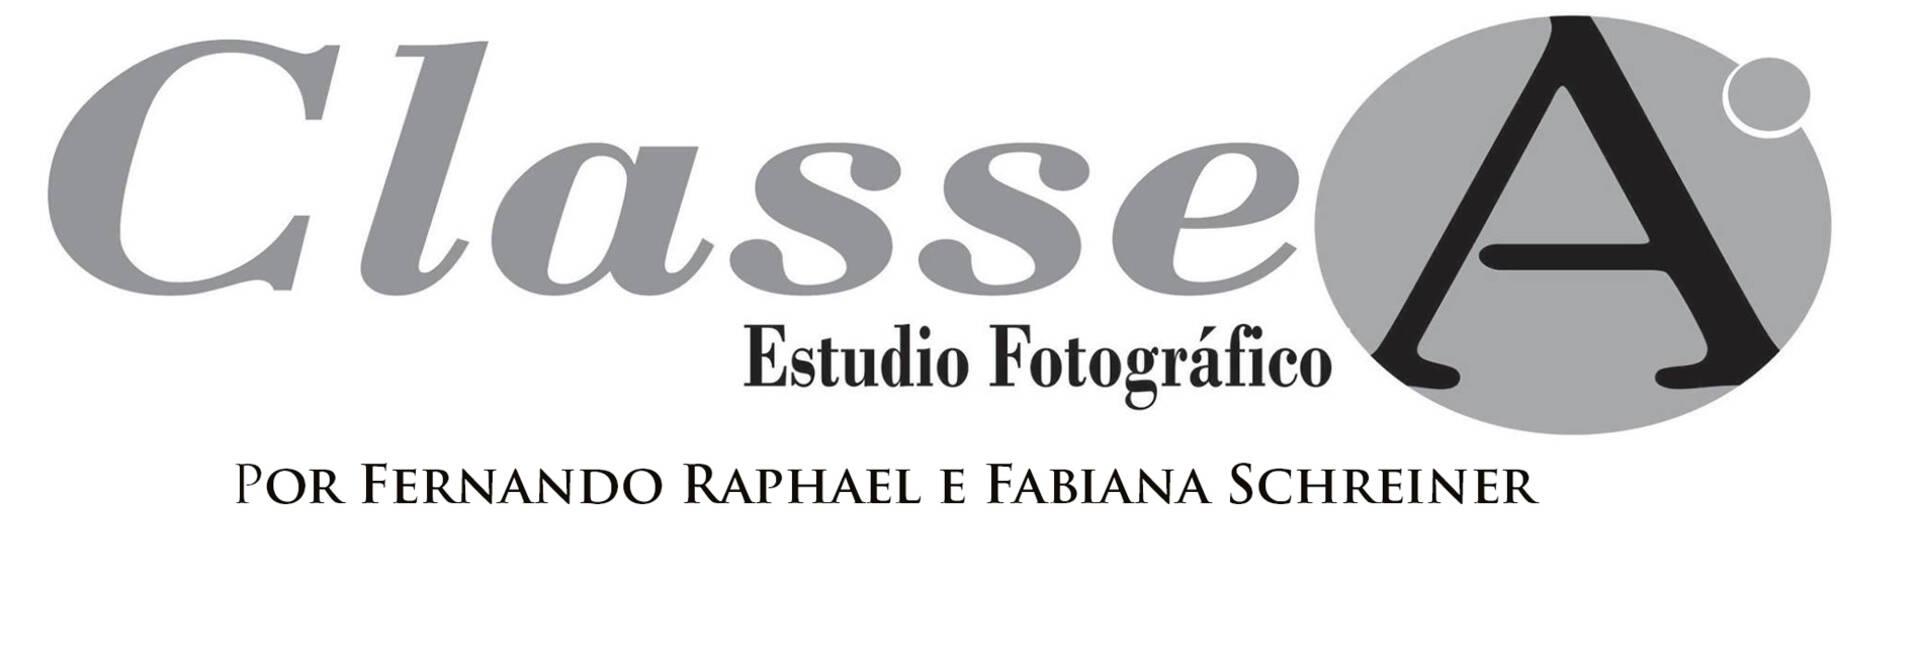 Fotografia profissional de Estudio Fotografico